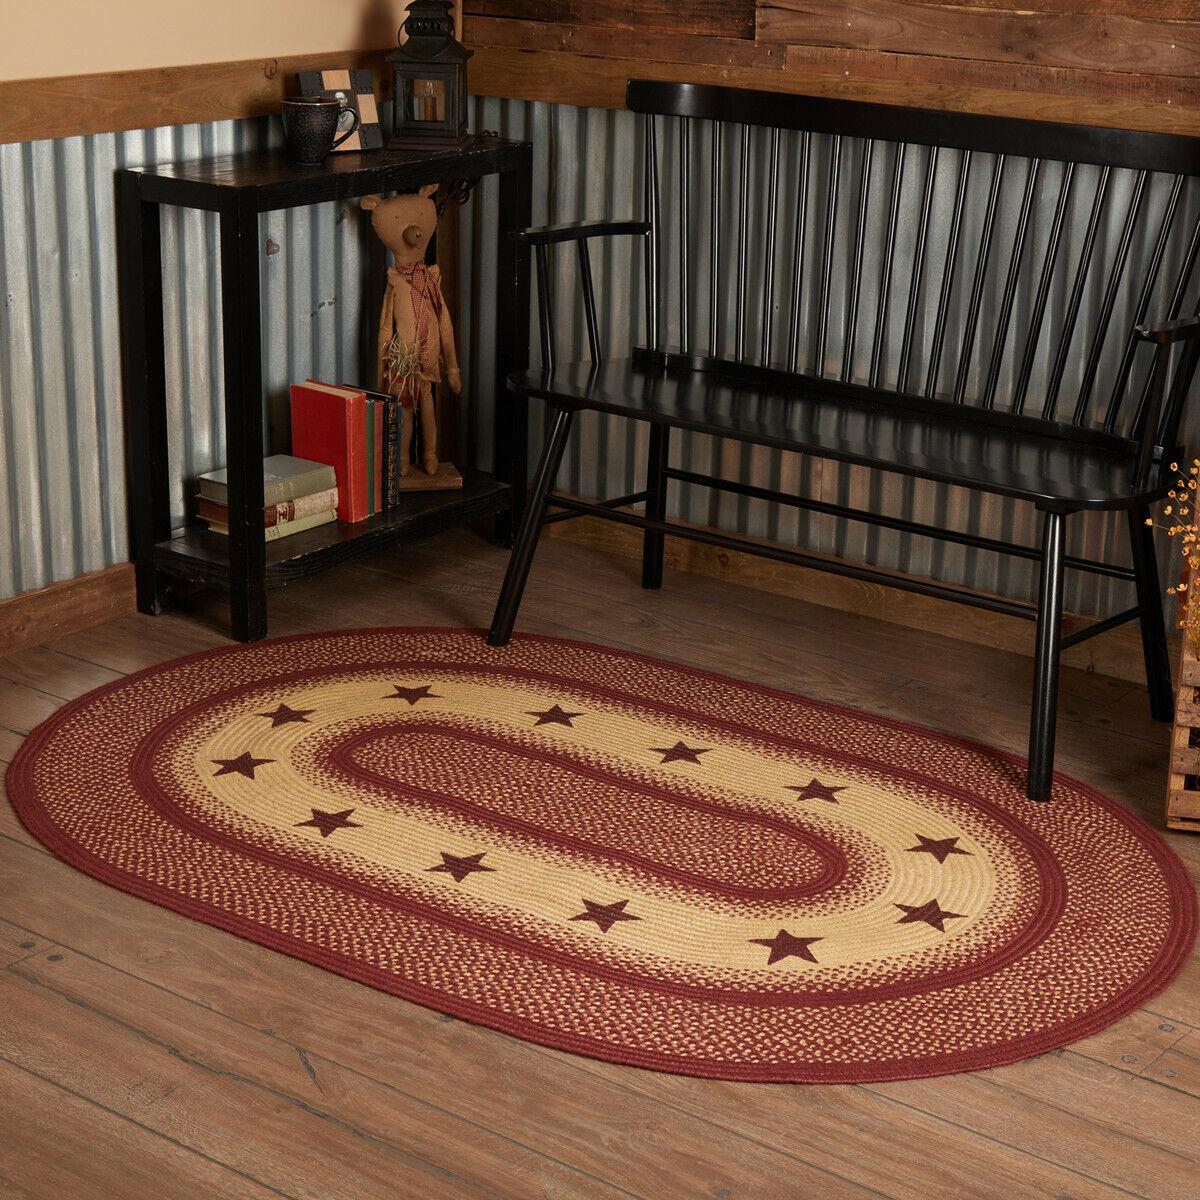 Oval Braided Rug For Online Ebay